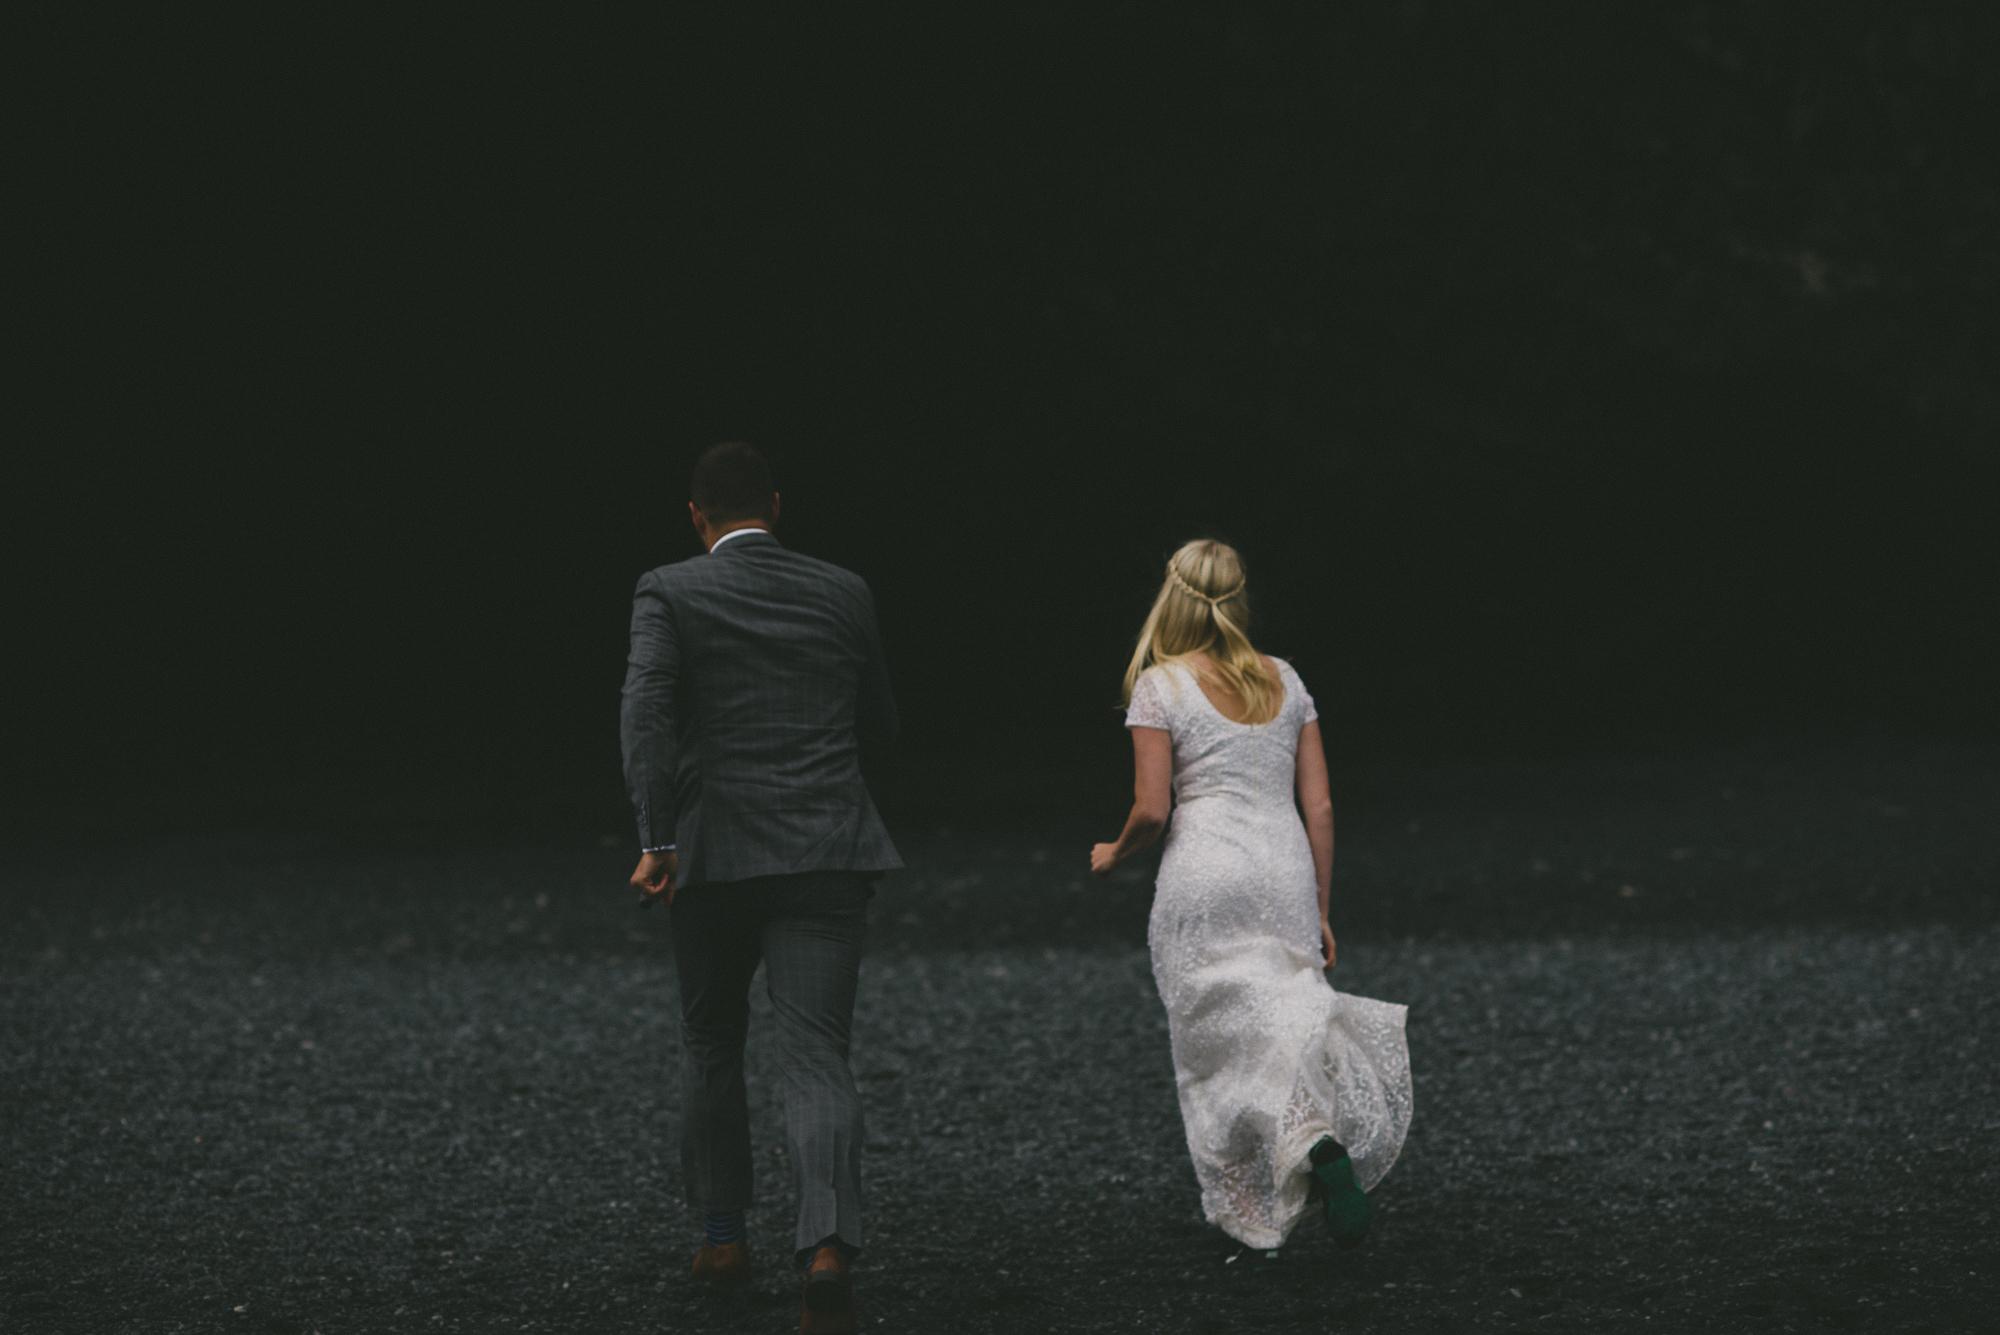 iceland-wedding-photographer-sara-rogers-photography-66.jpg